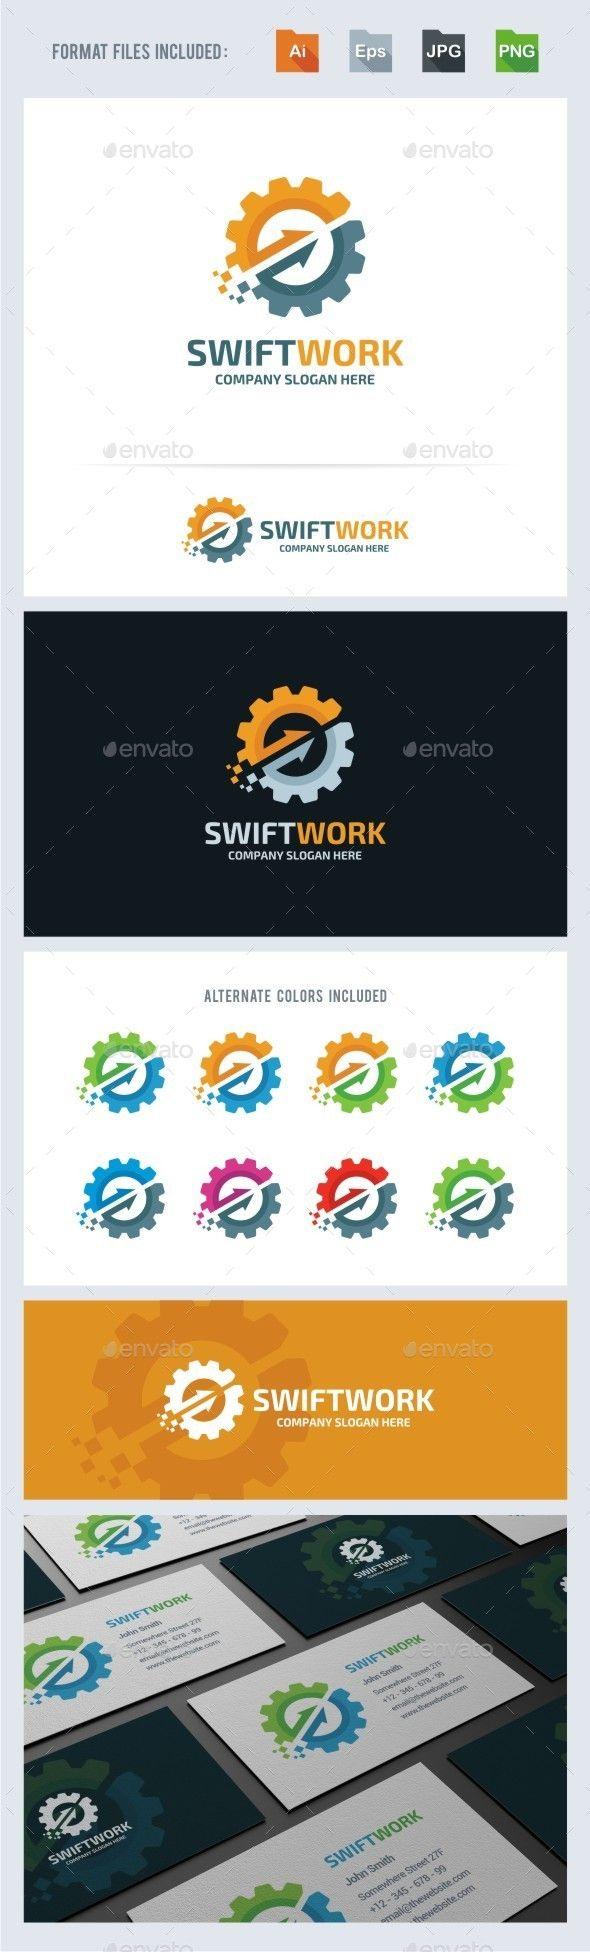 Swift Work Gear  - Logo Design Template Vector #logotype Download it here: http://graphicriver.net/item/swift-work-gear-logo-template/13949342?s_rank=1144?ref=nesto